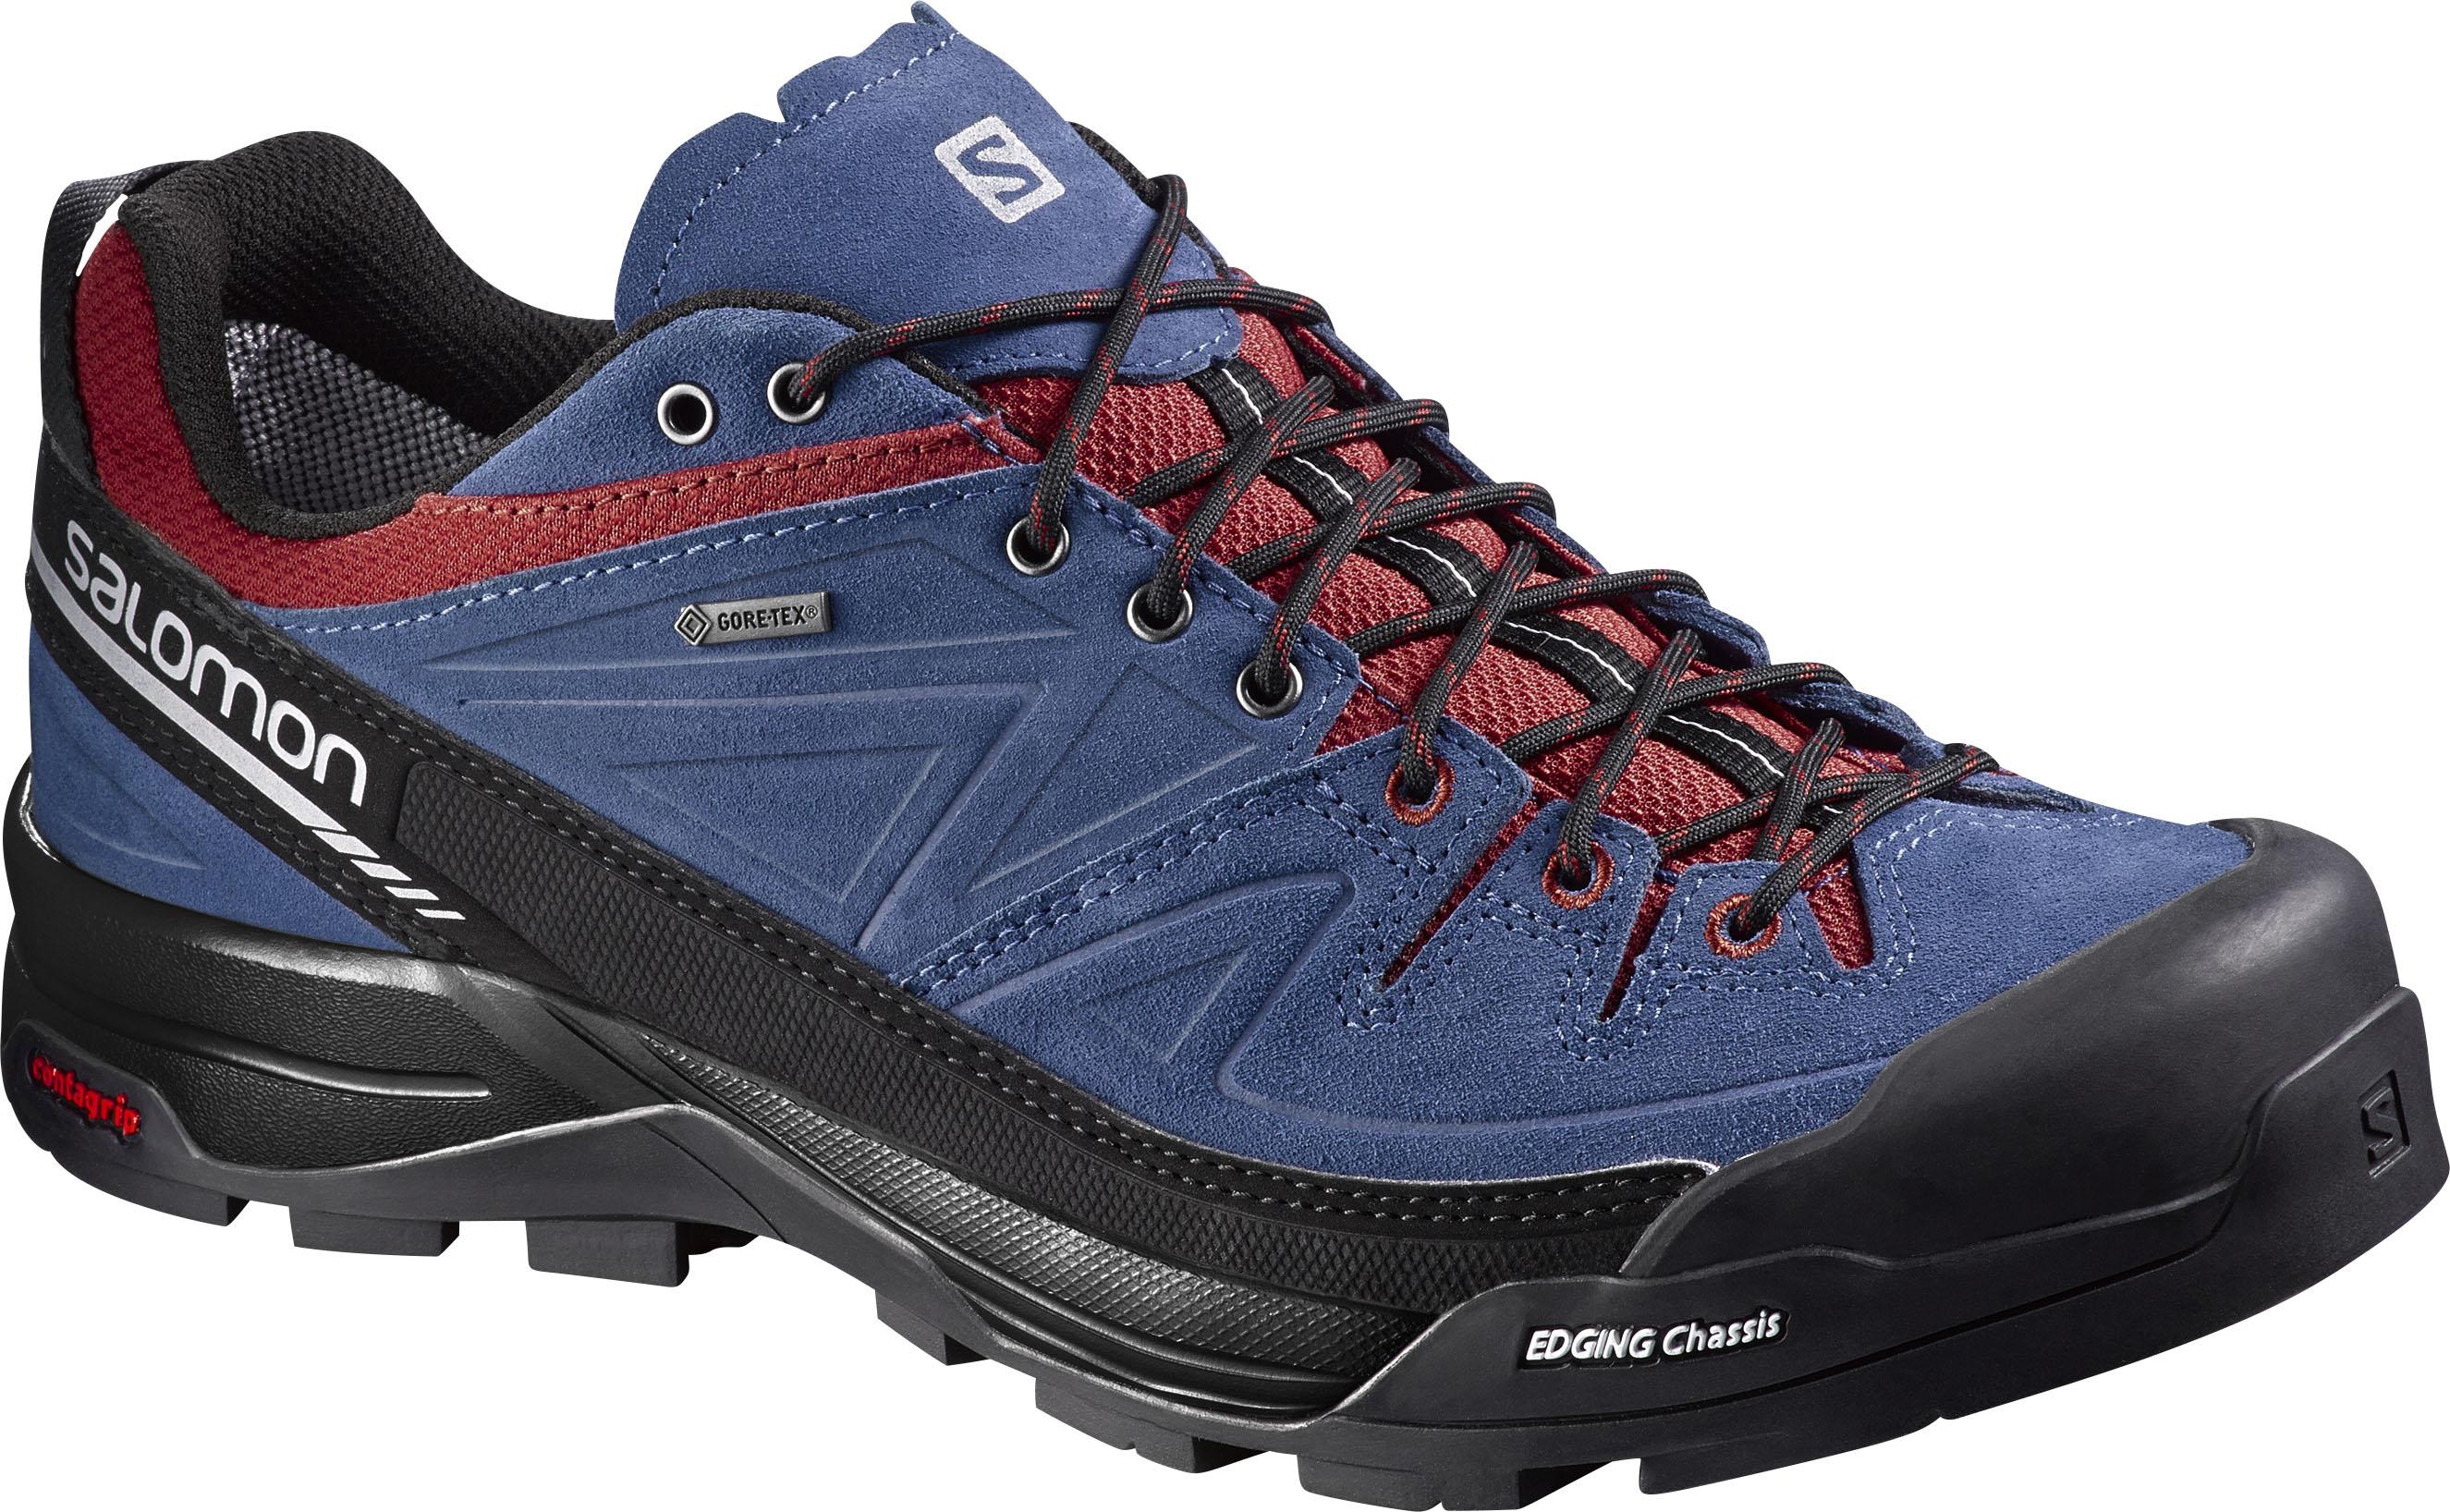 Salomon X Alp LTR GTX 379267 modrá 43,3